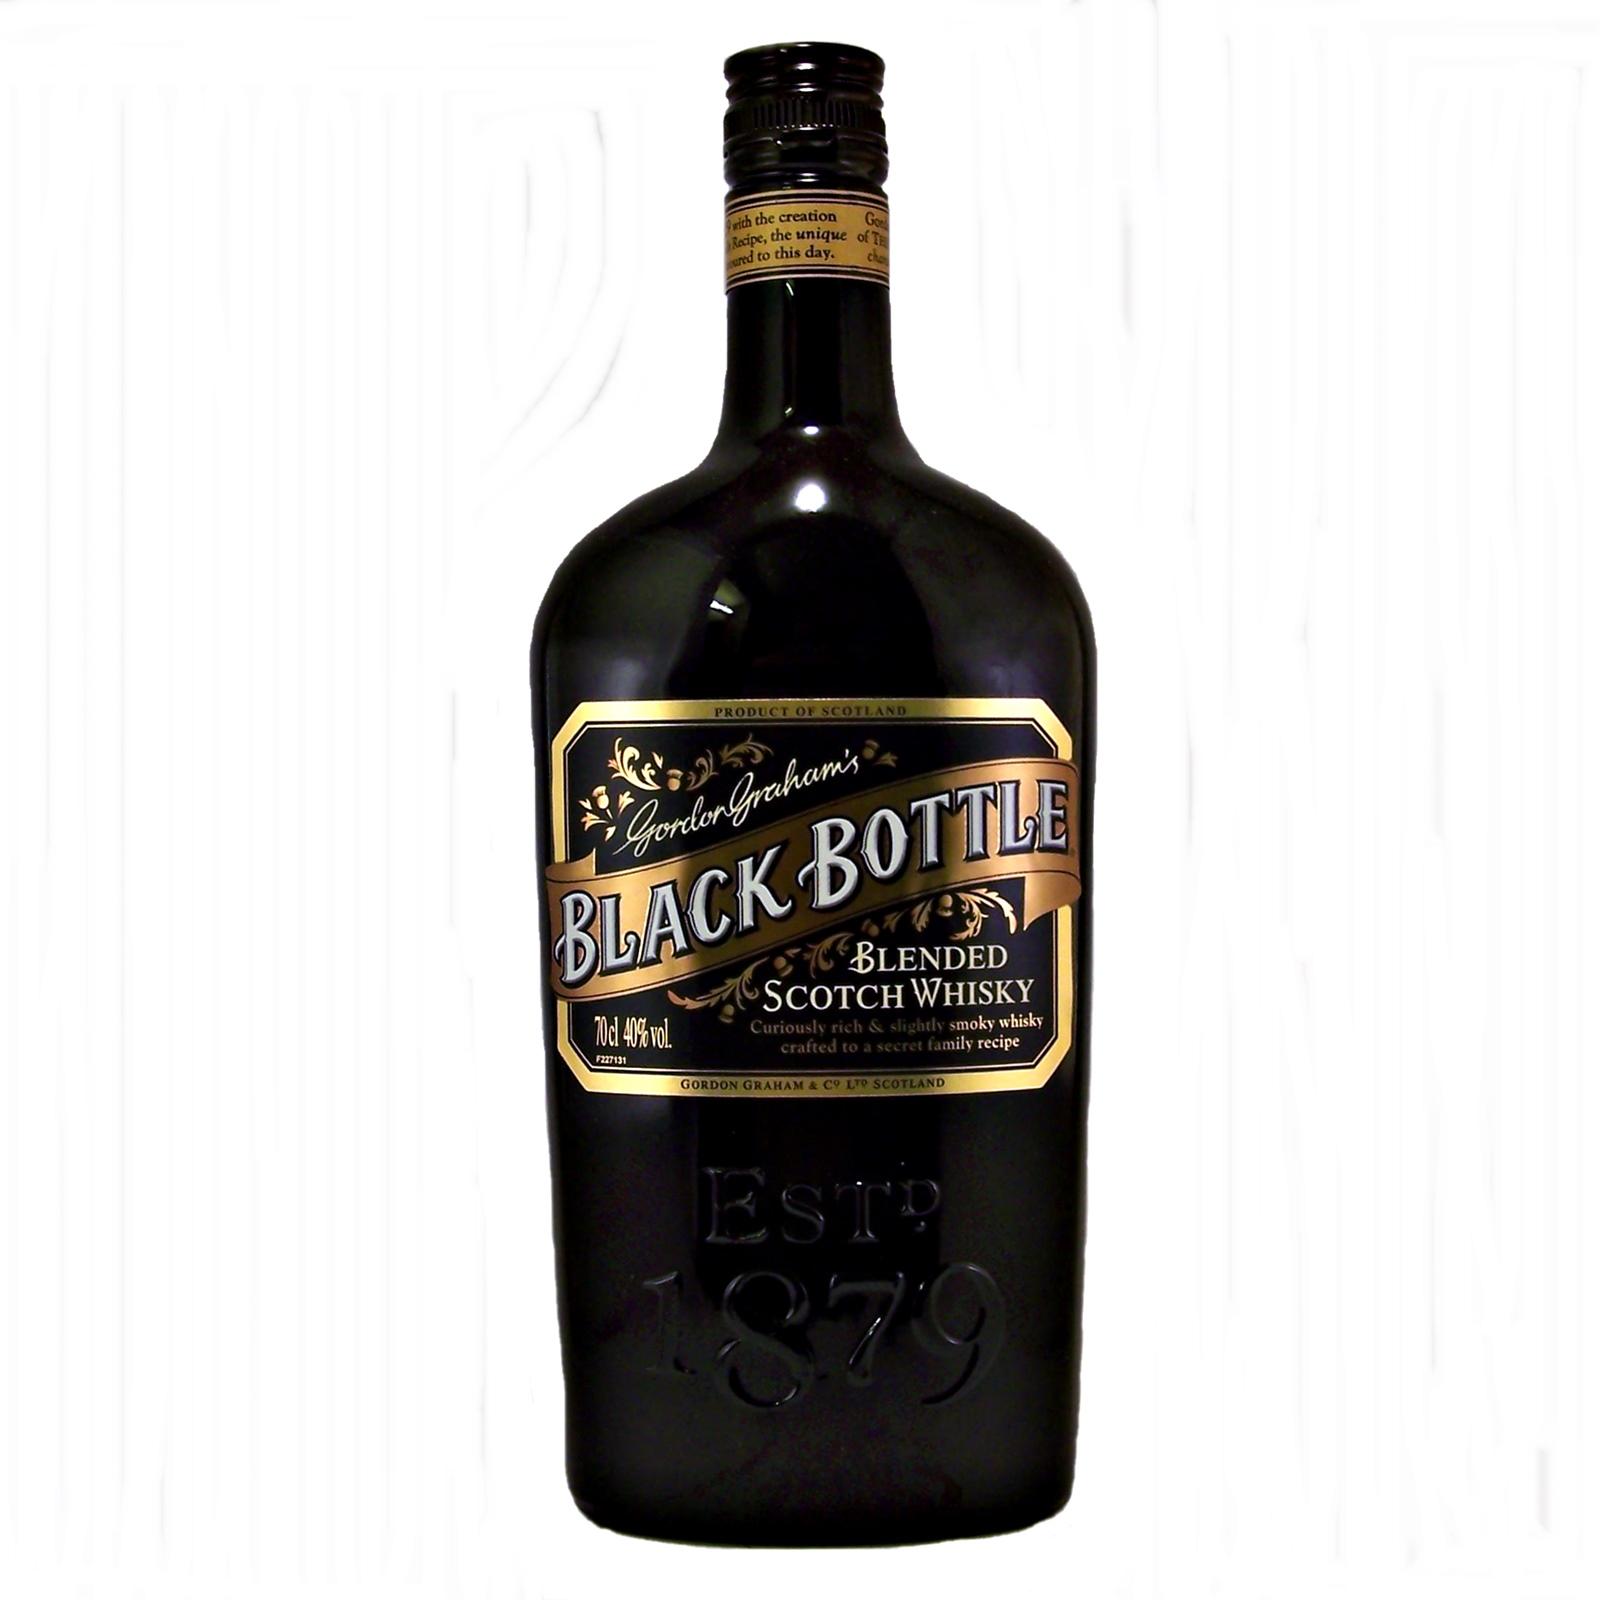 Black Bottle Scotch Whisky Buy Online Whiskys Co Uk